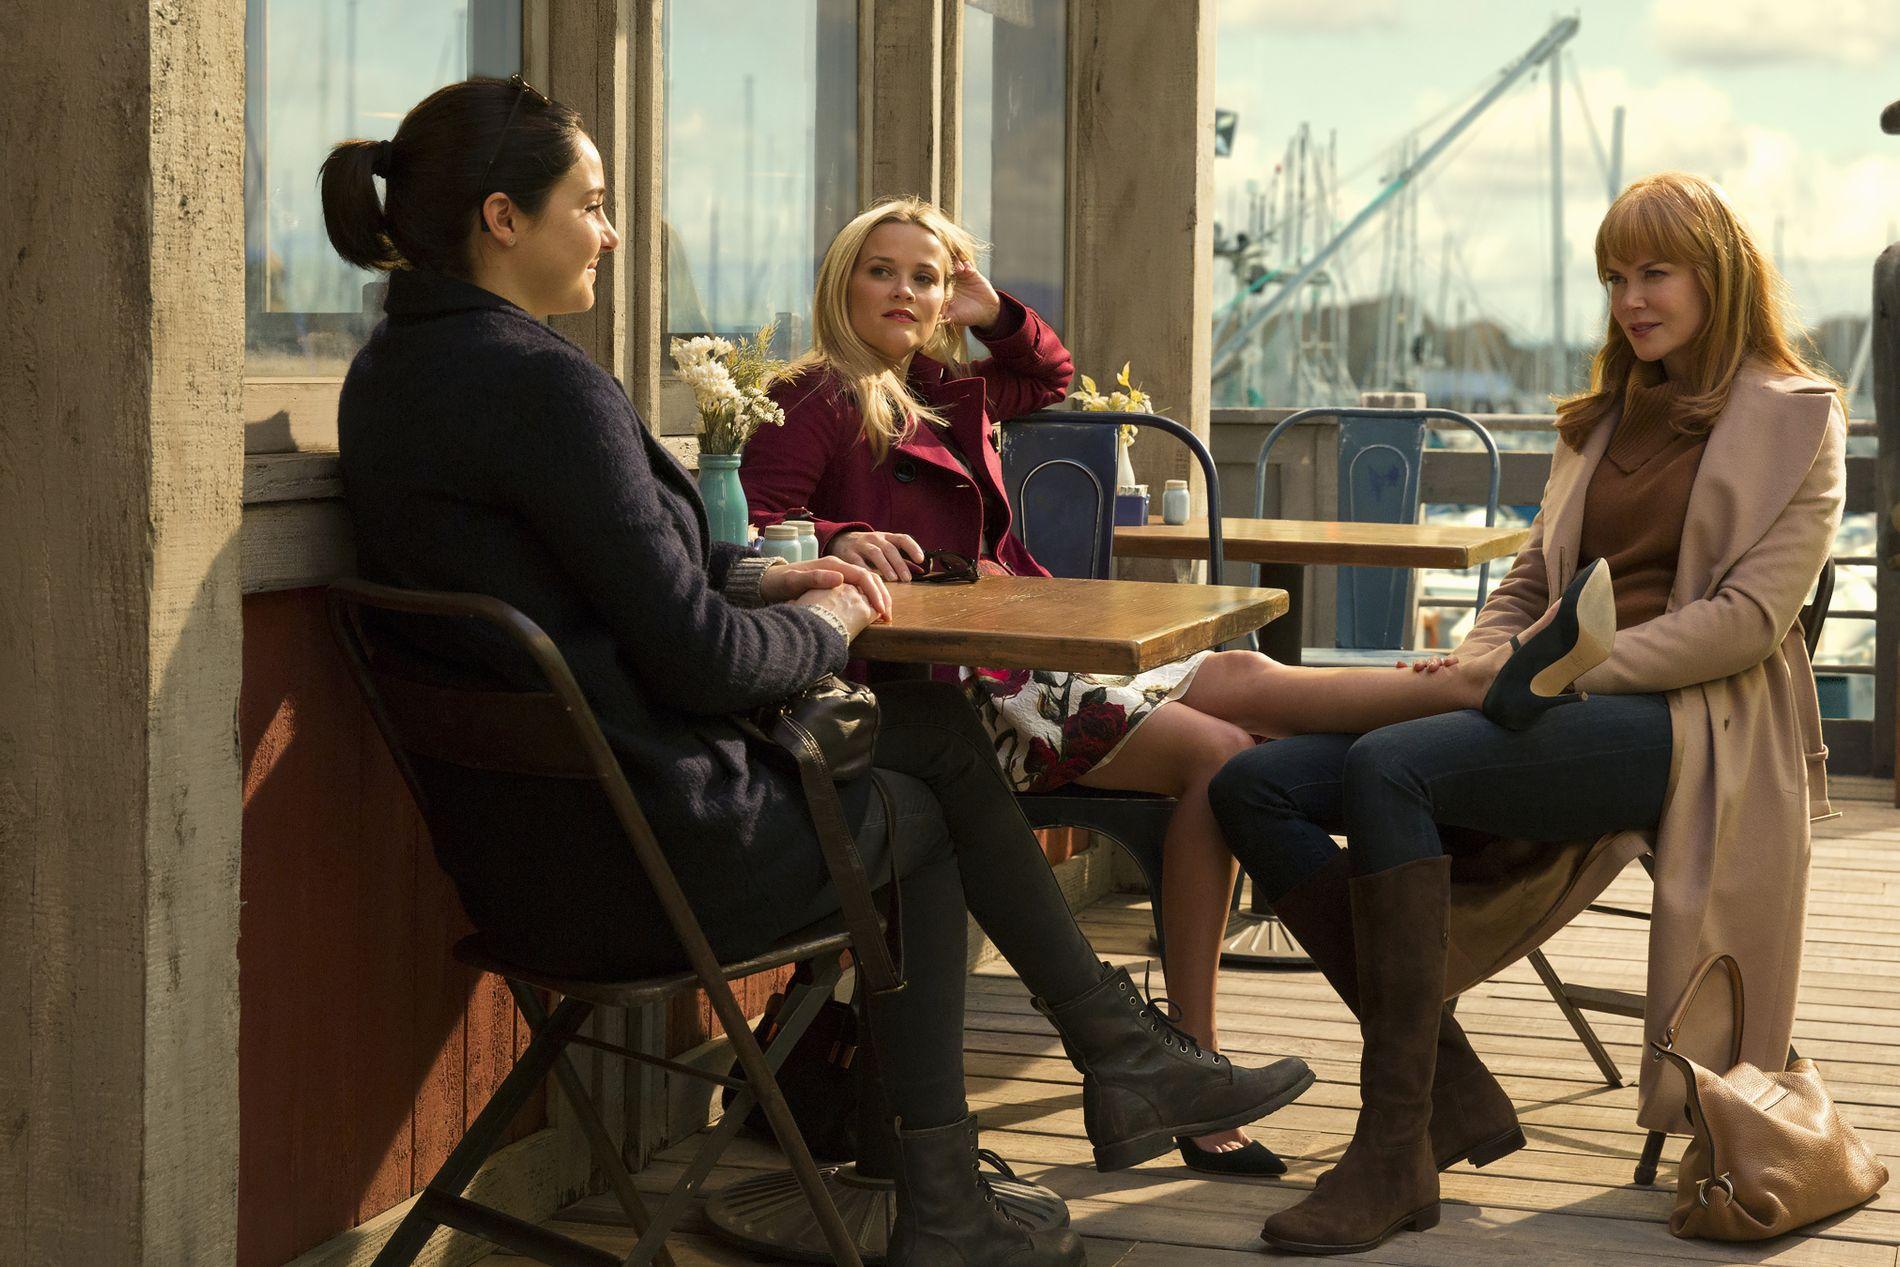 KVINNEKLUBBEN: Shailene Woodley, Reese Witherspoon og Nicole Kidman i «Big Little Lies».